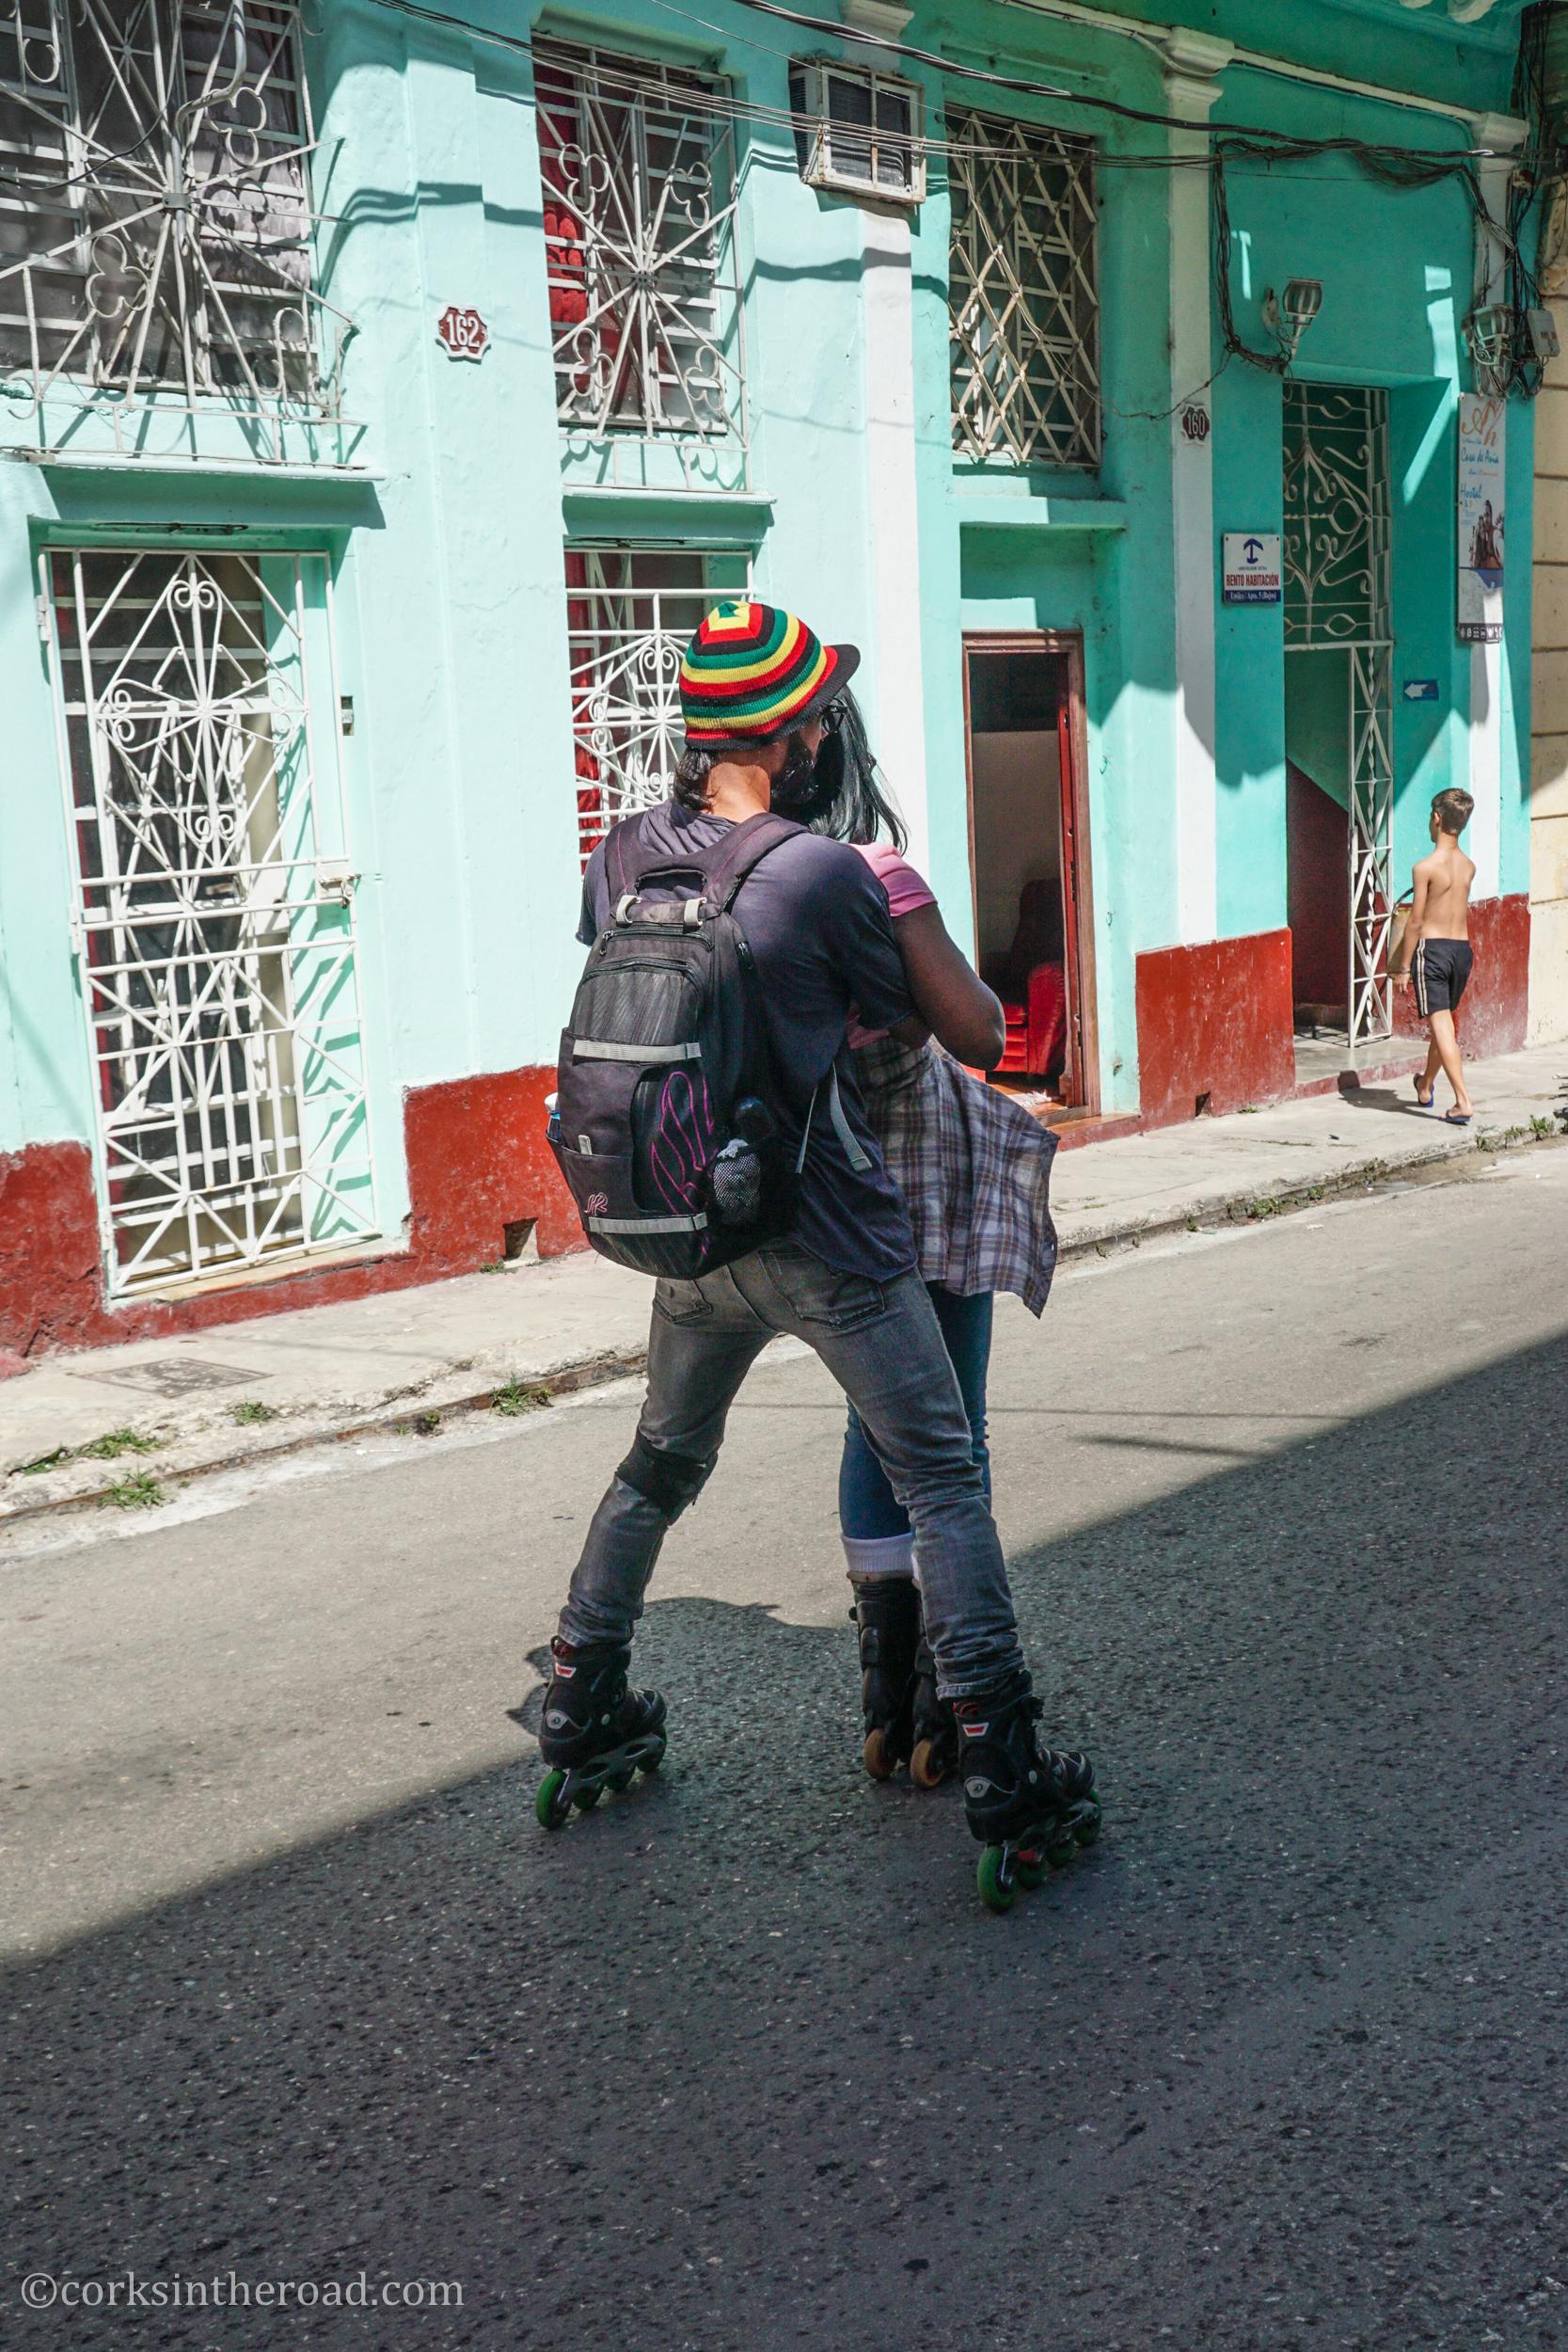 Corksintheroad, Cuba, Havana.jpg